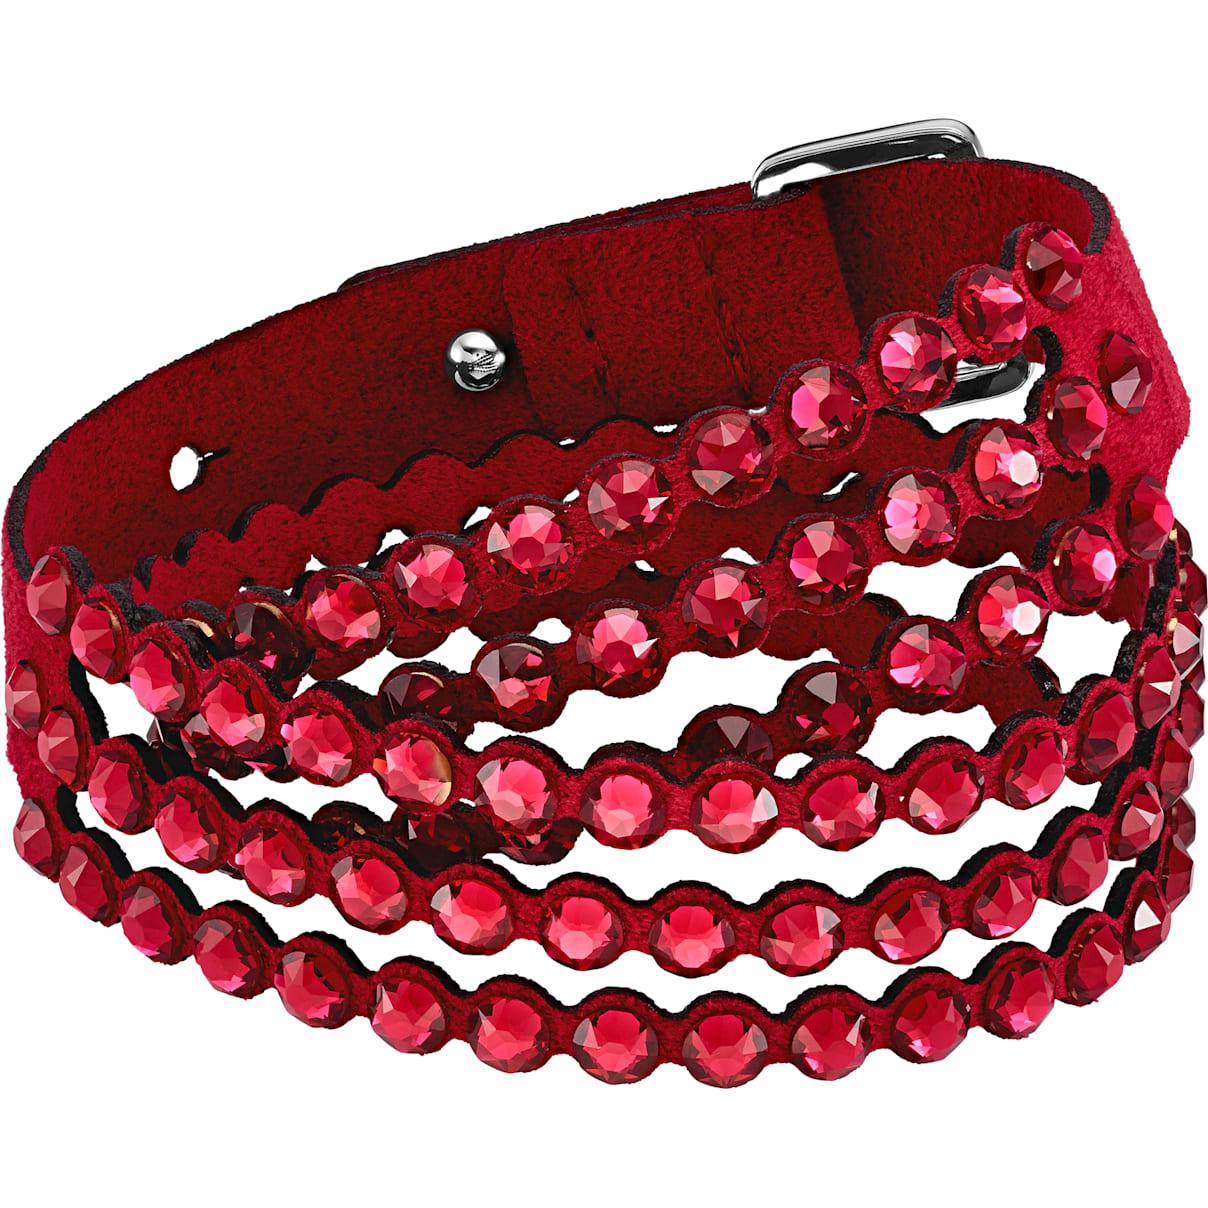 Swarovski Swarovski Power Collection Bracelet, Red